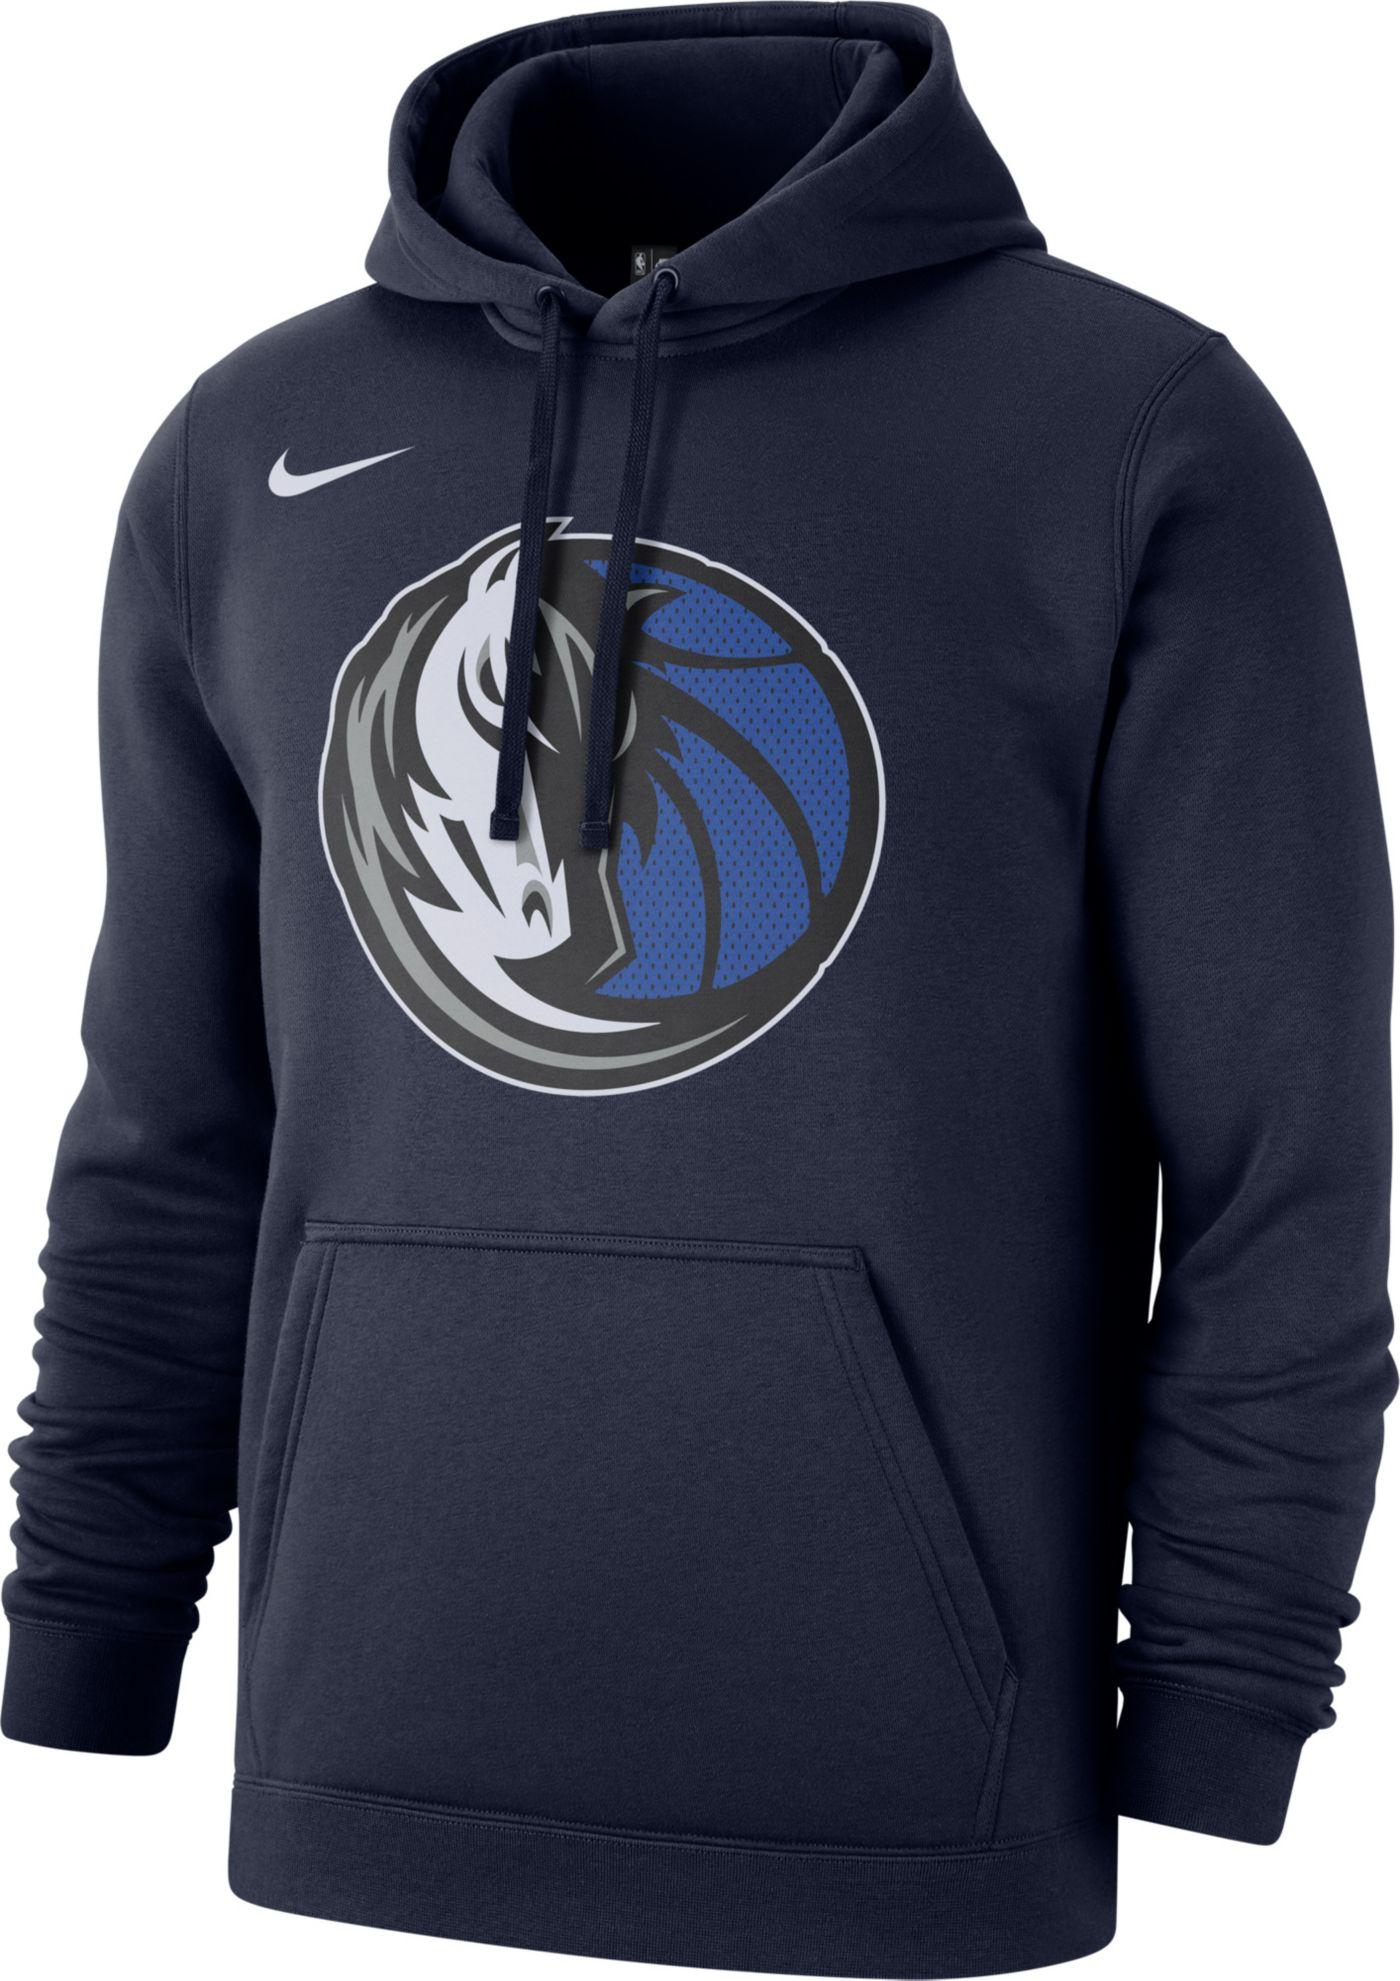 Nike Men's Dallas Mavericks Pullover Hoodie